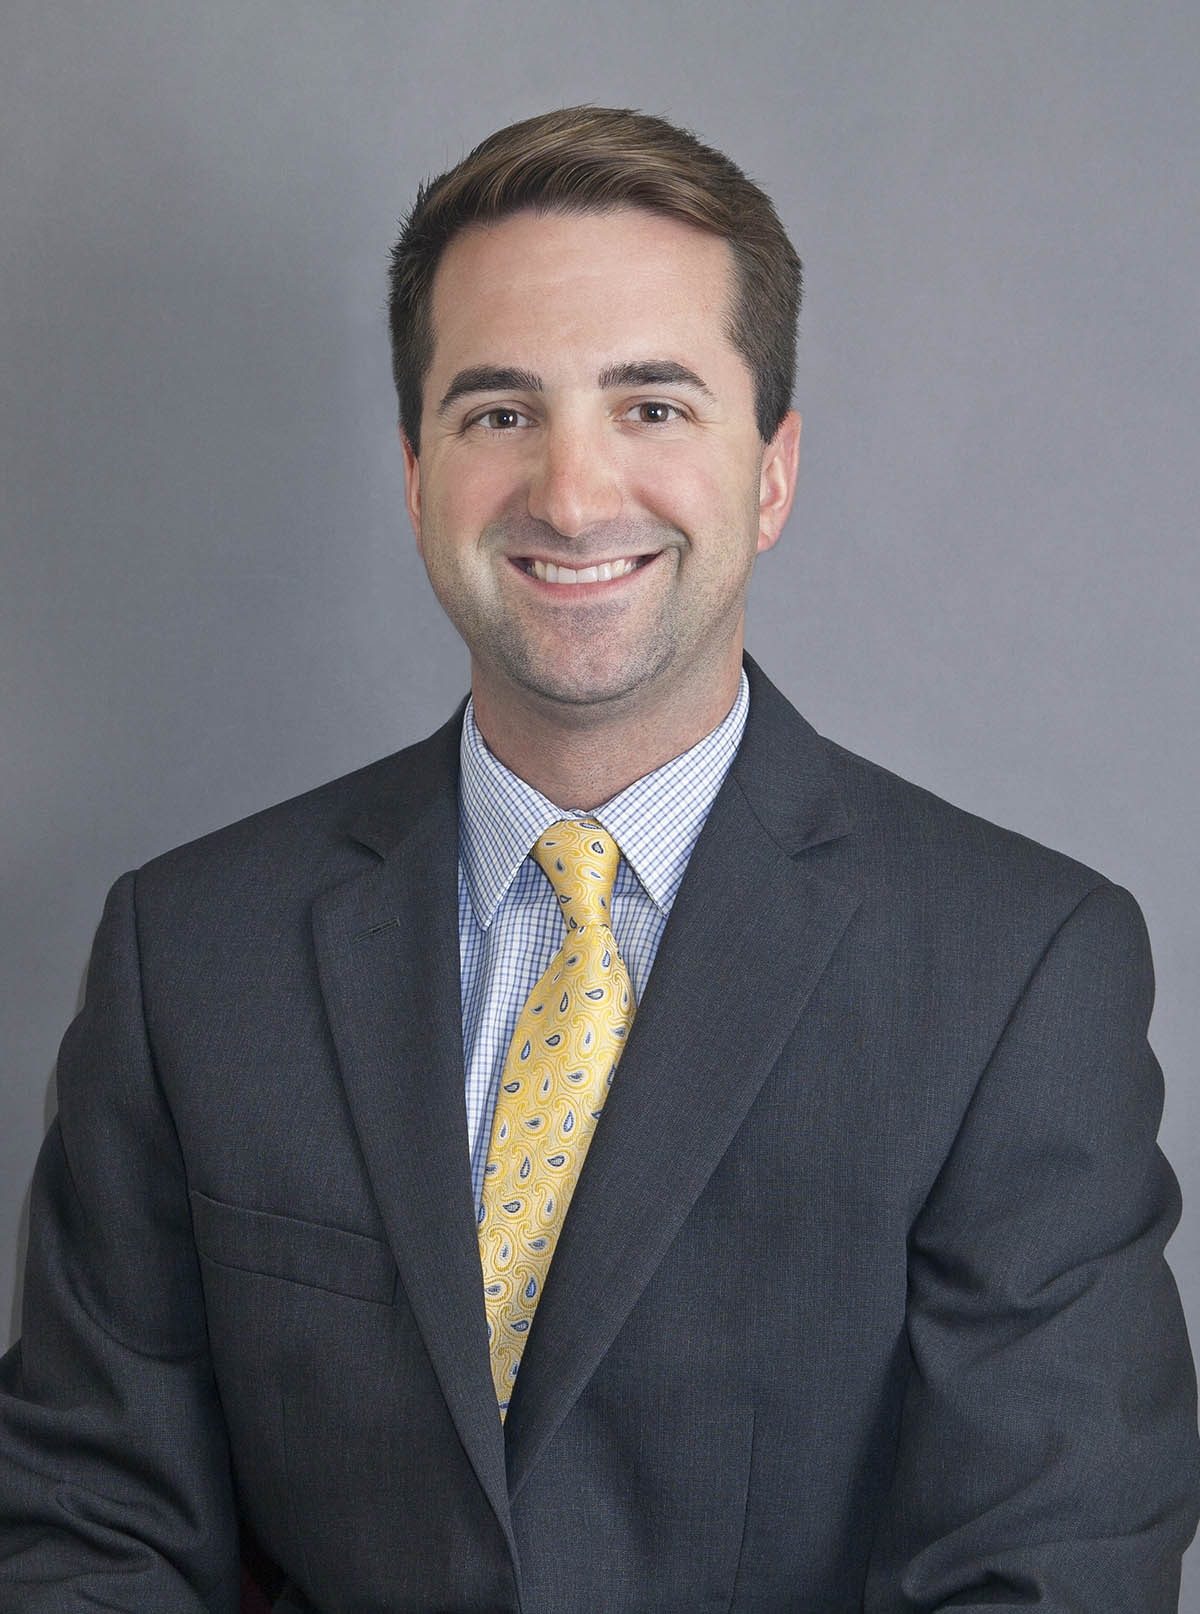 Monona Bank Business Banker Ryan Ackerman